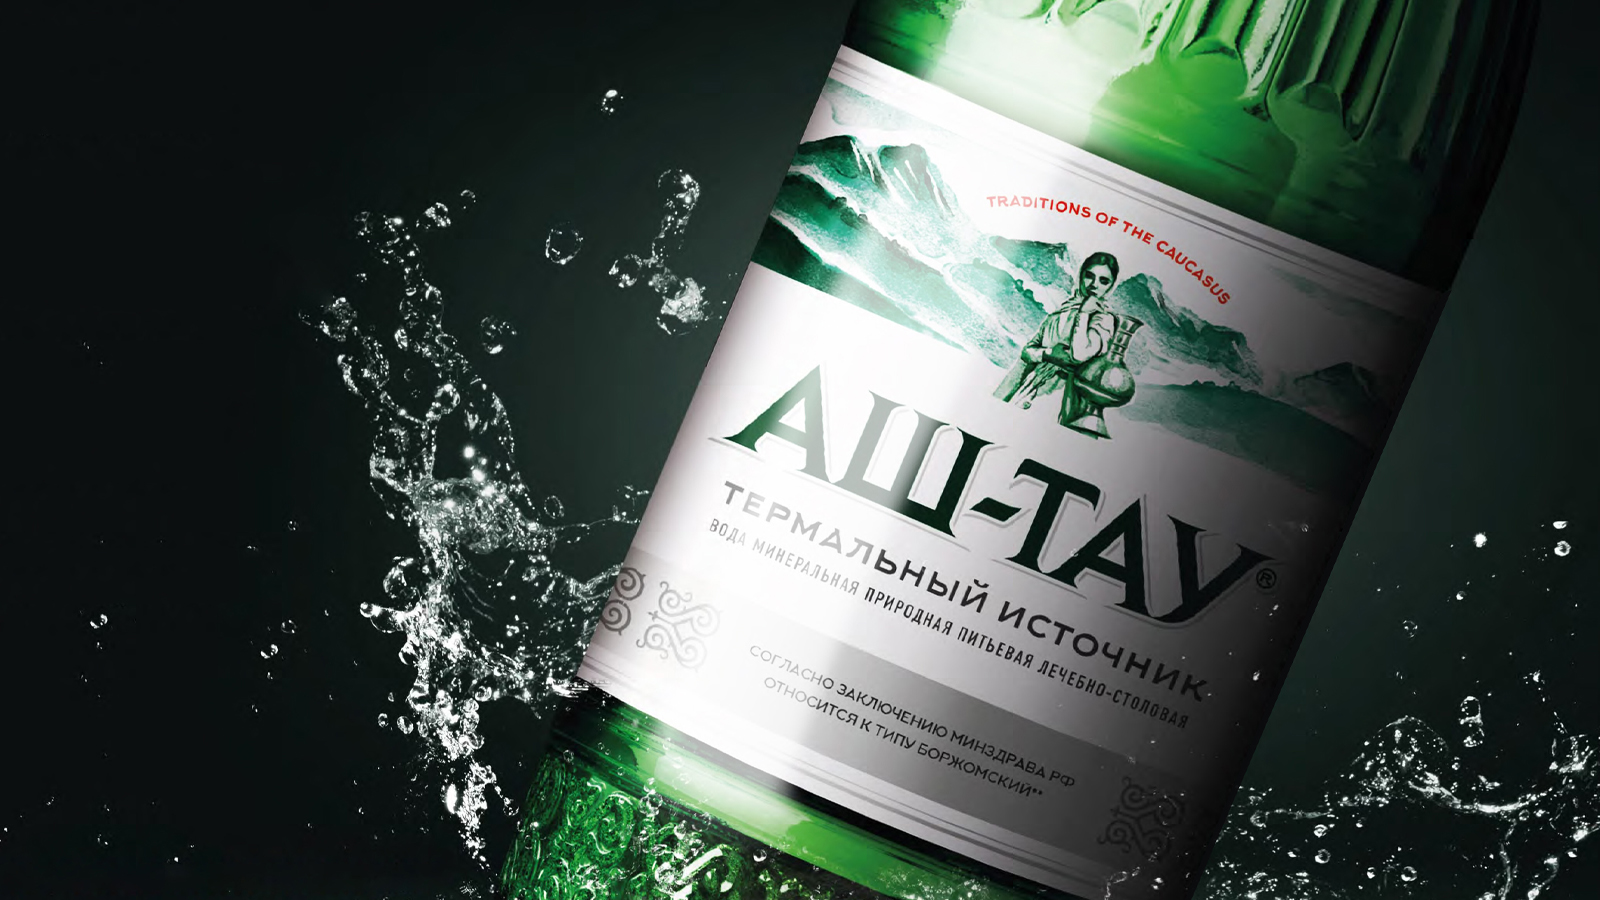 Ash Tau Stariy Istochnik Mineral Water Packaging Design Break Design